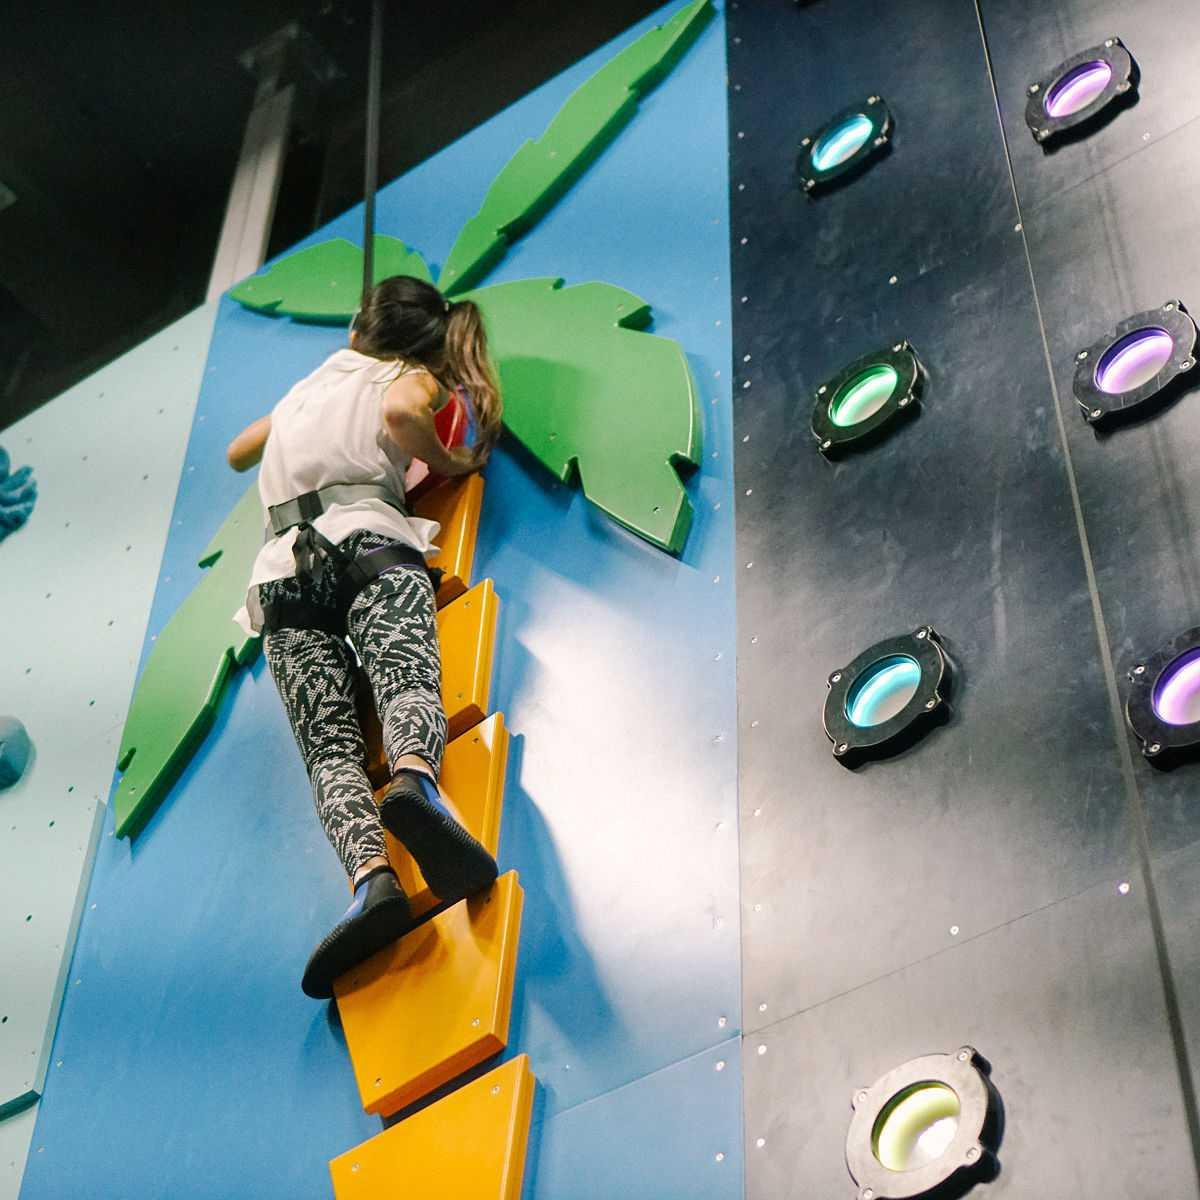 Climbers Laboratory, Rock Climbing in Singapore